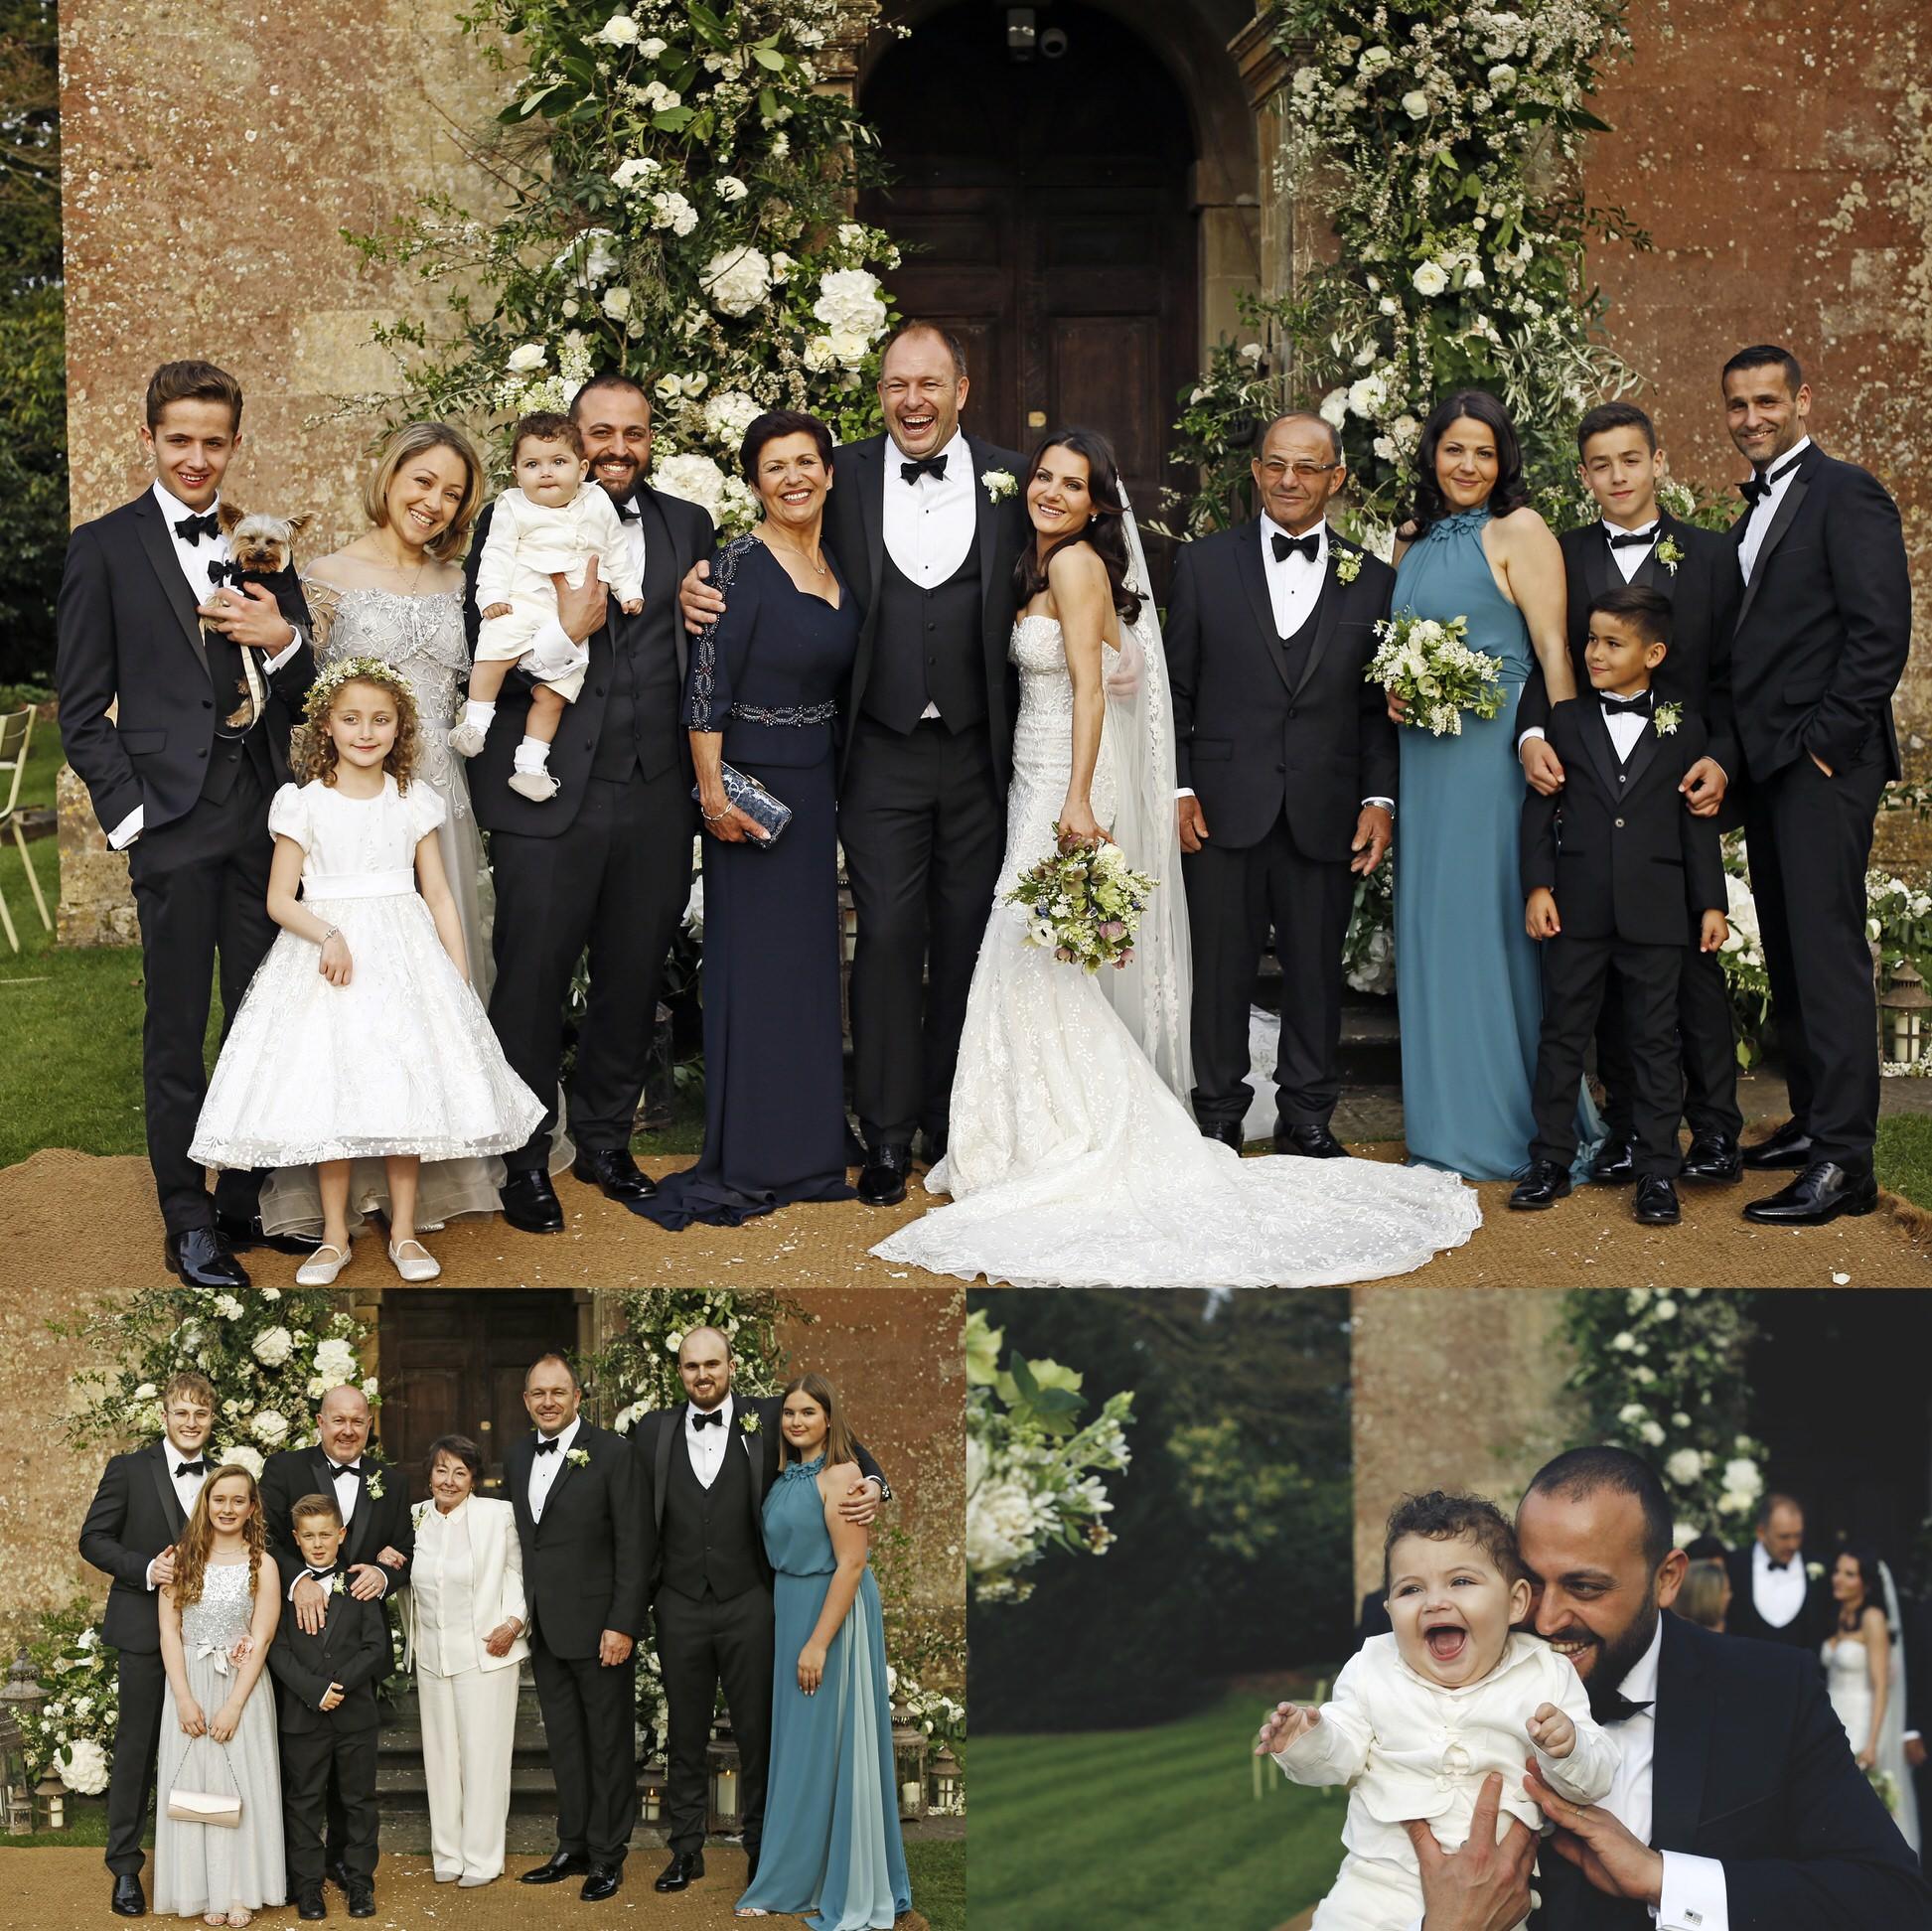 brettharkness-luxury-wedding-photographer-uk_0039.jpg